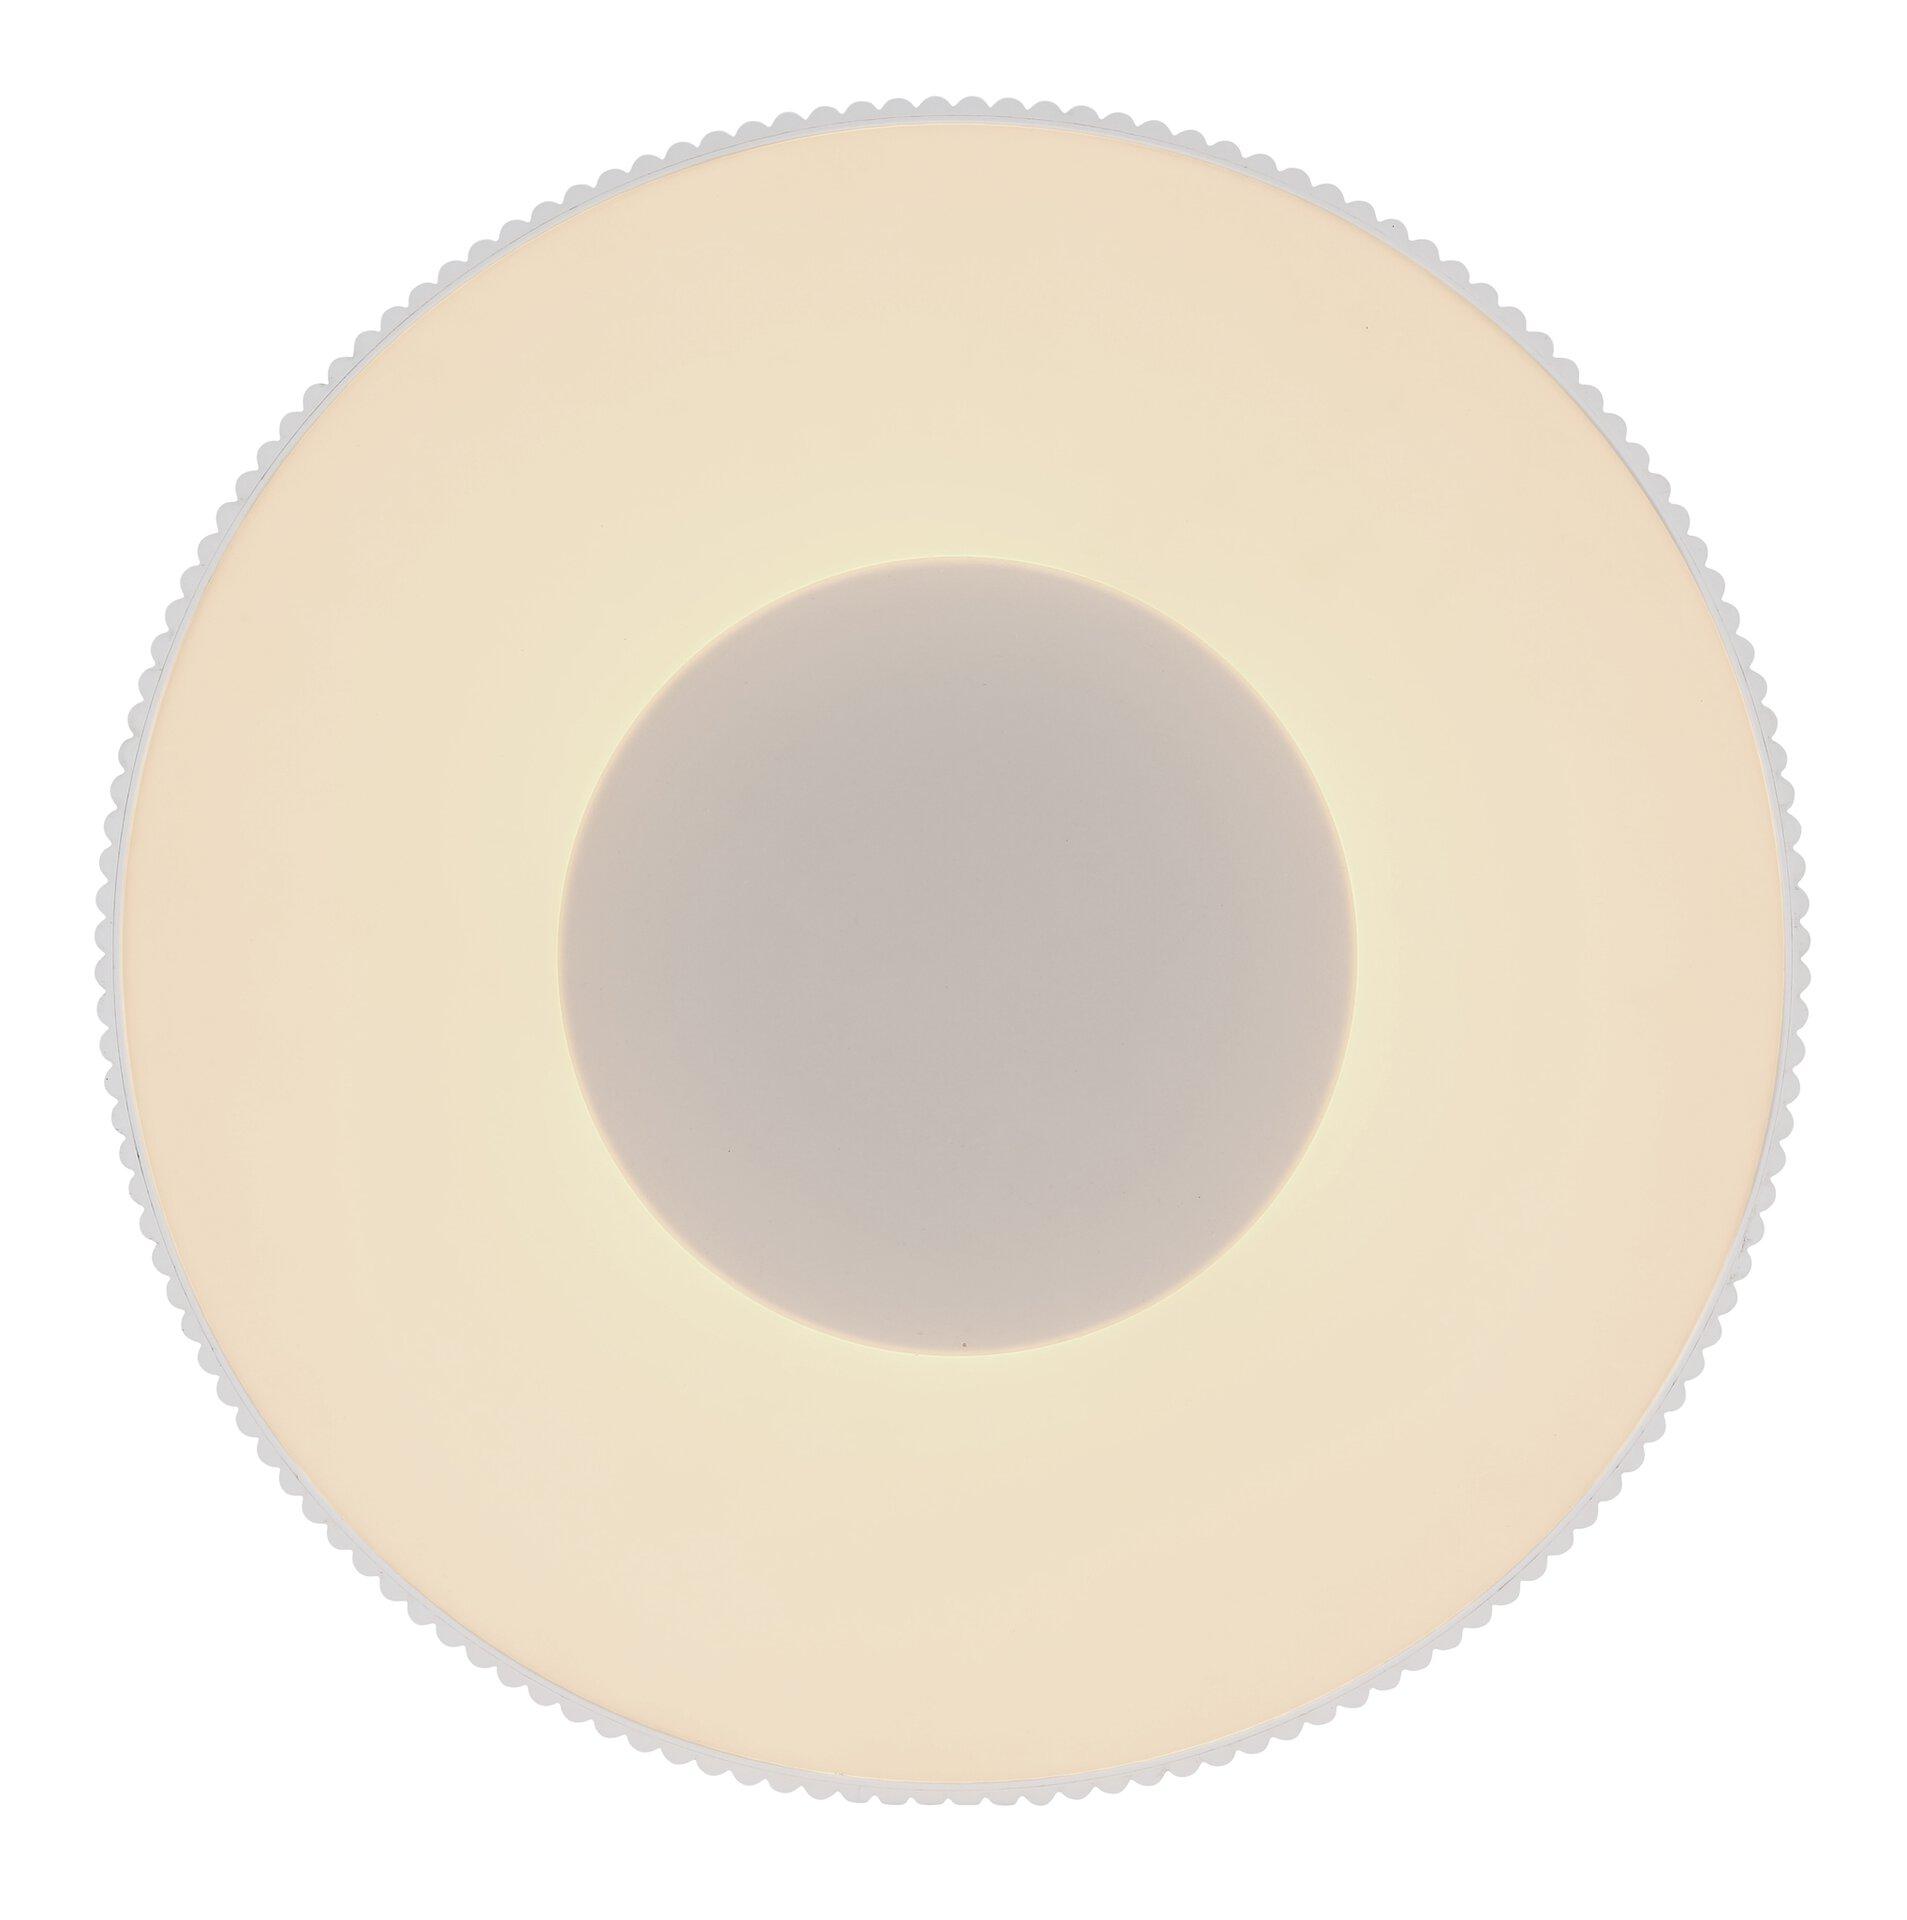 Deckenleuchte CROTONE Globo Metall weiß 46 x 17 x 46 cm